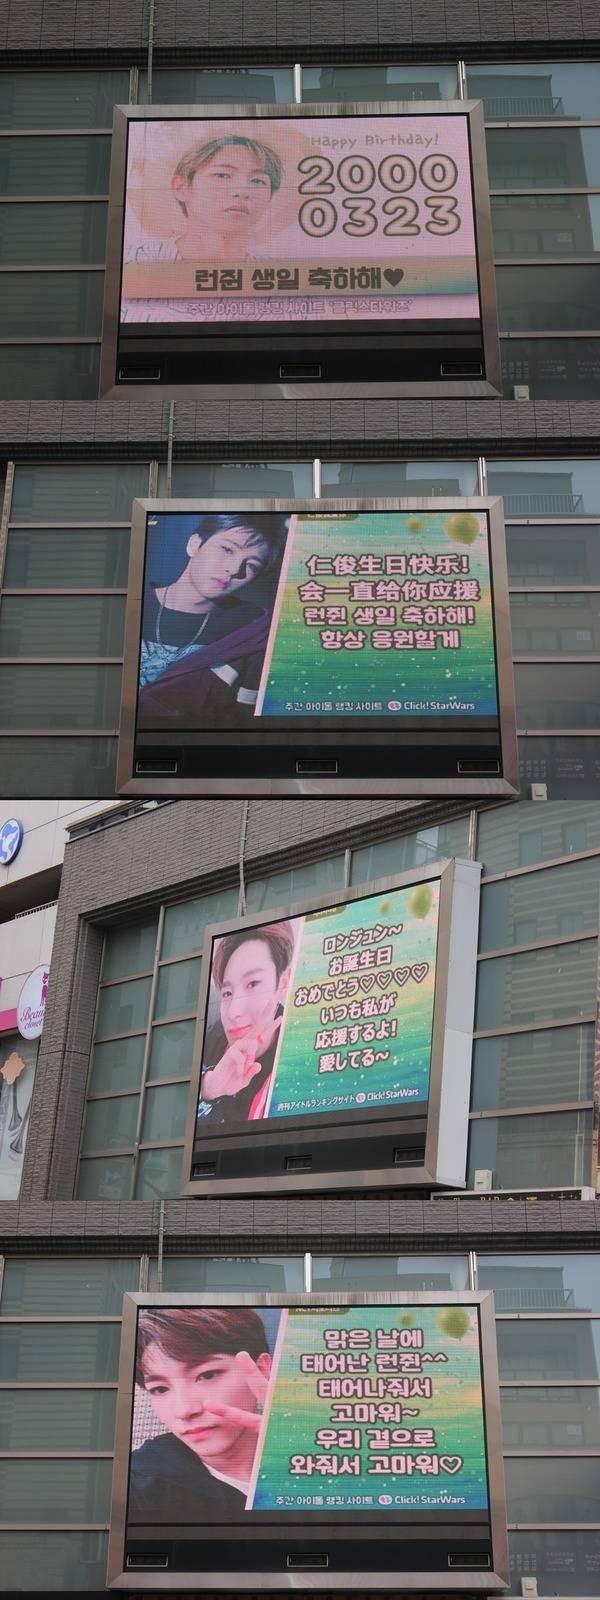 NCT 런쥔, 日 빛낸 생일 축하 전광판 '애정 가득'